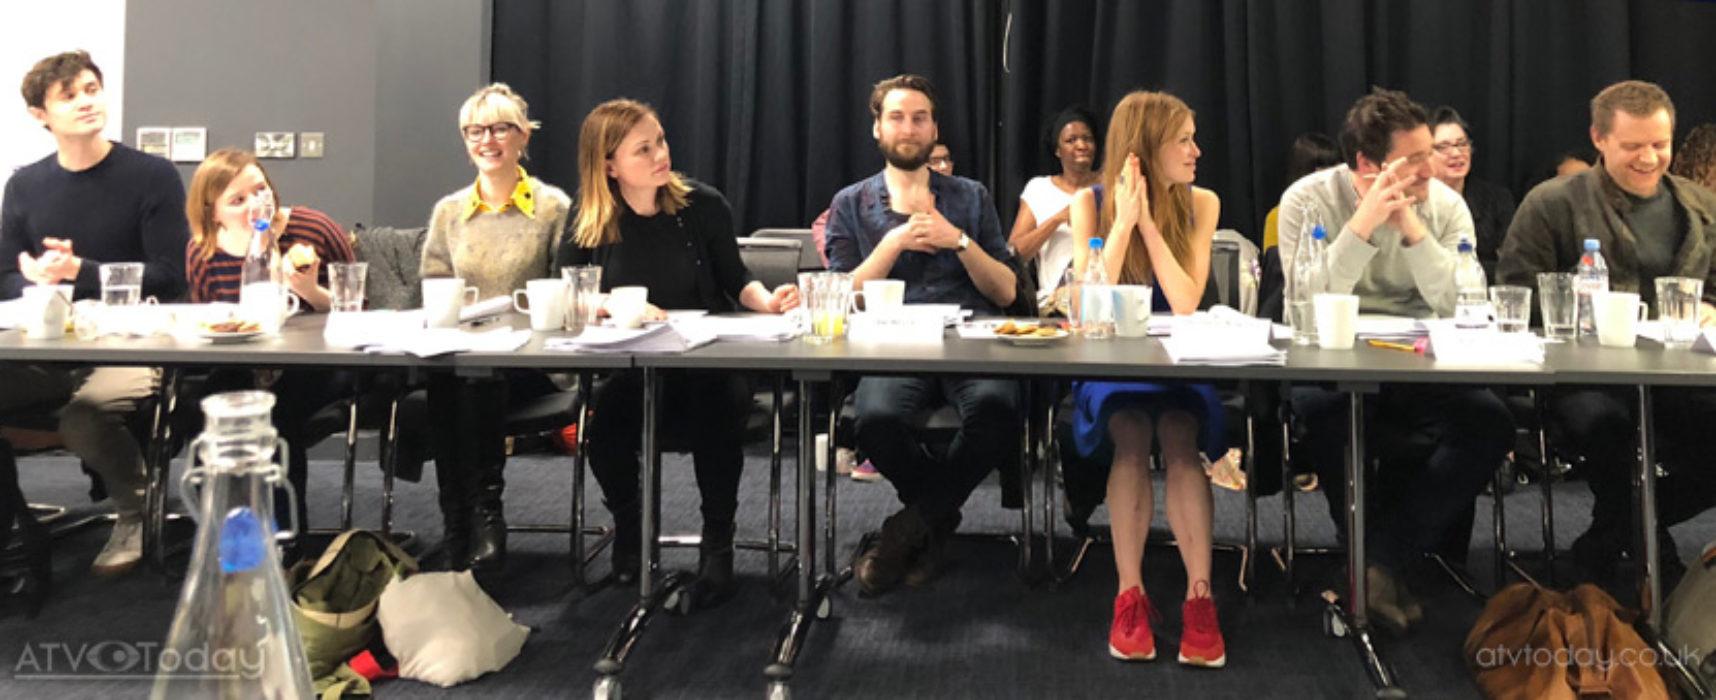 Flack cast announced for UKTV drama